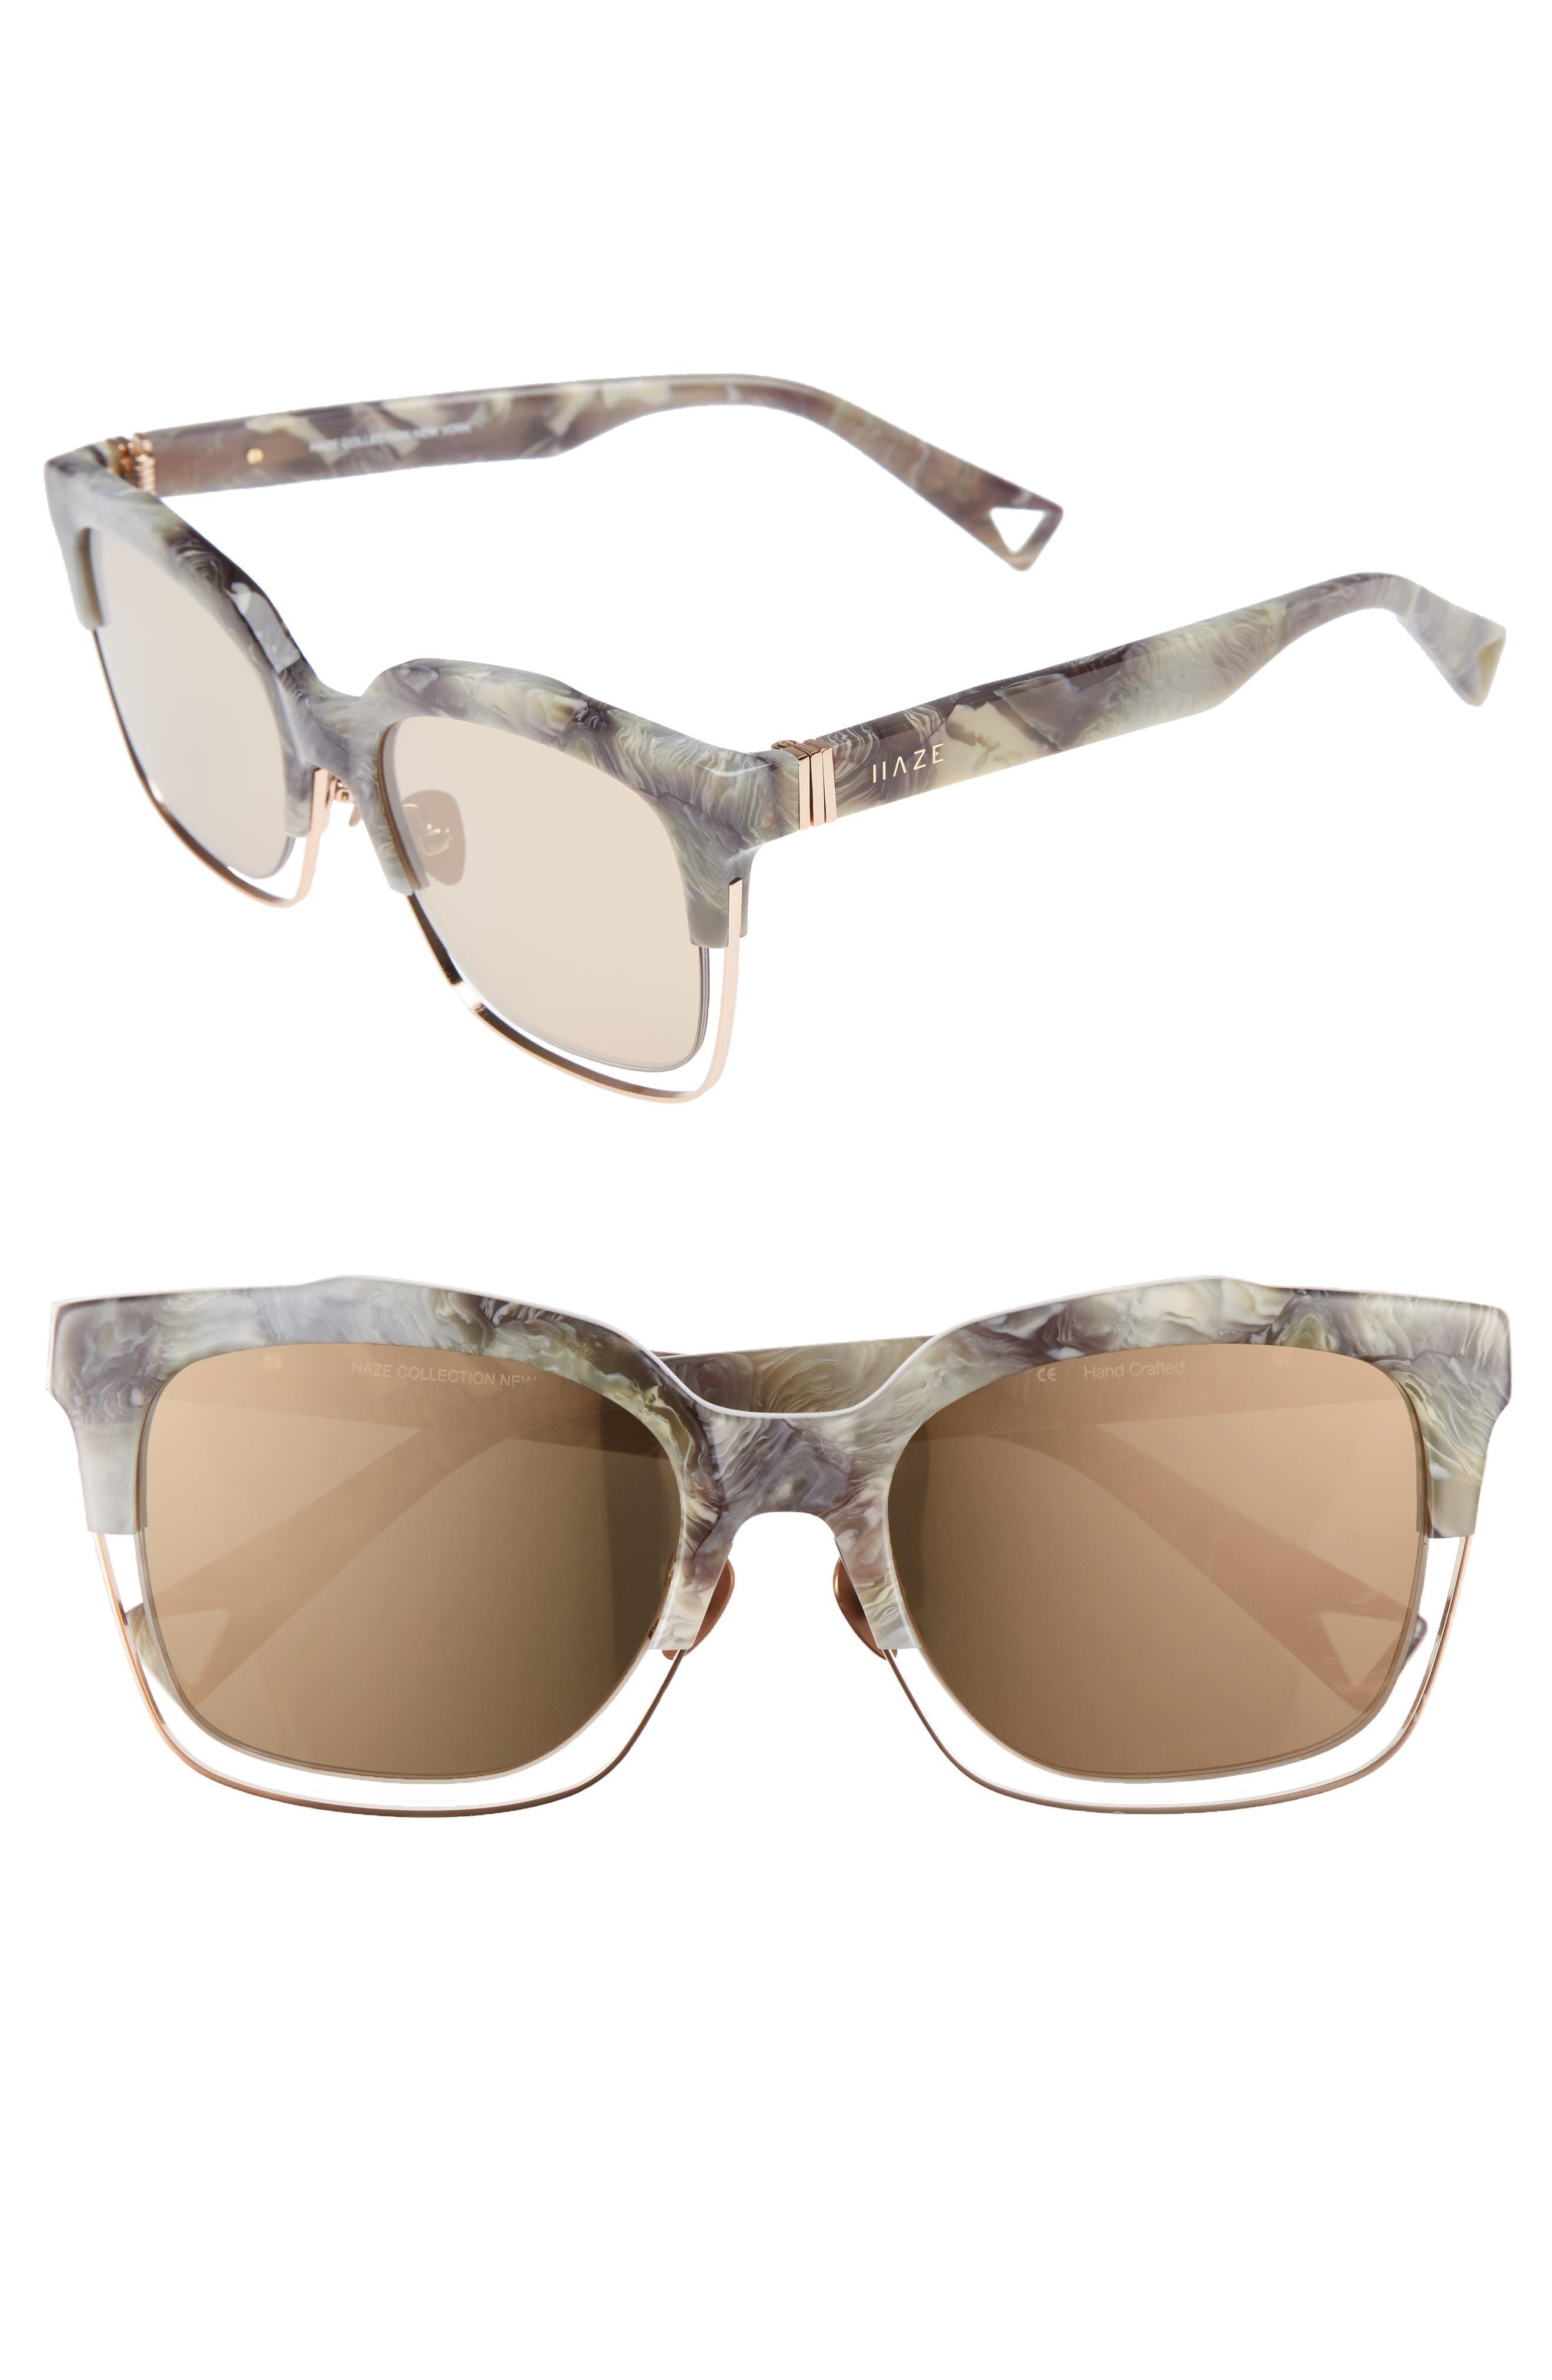 HAZE Buzz 55mm Mirrored Sunglasses